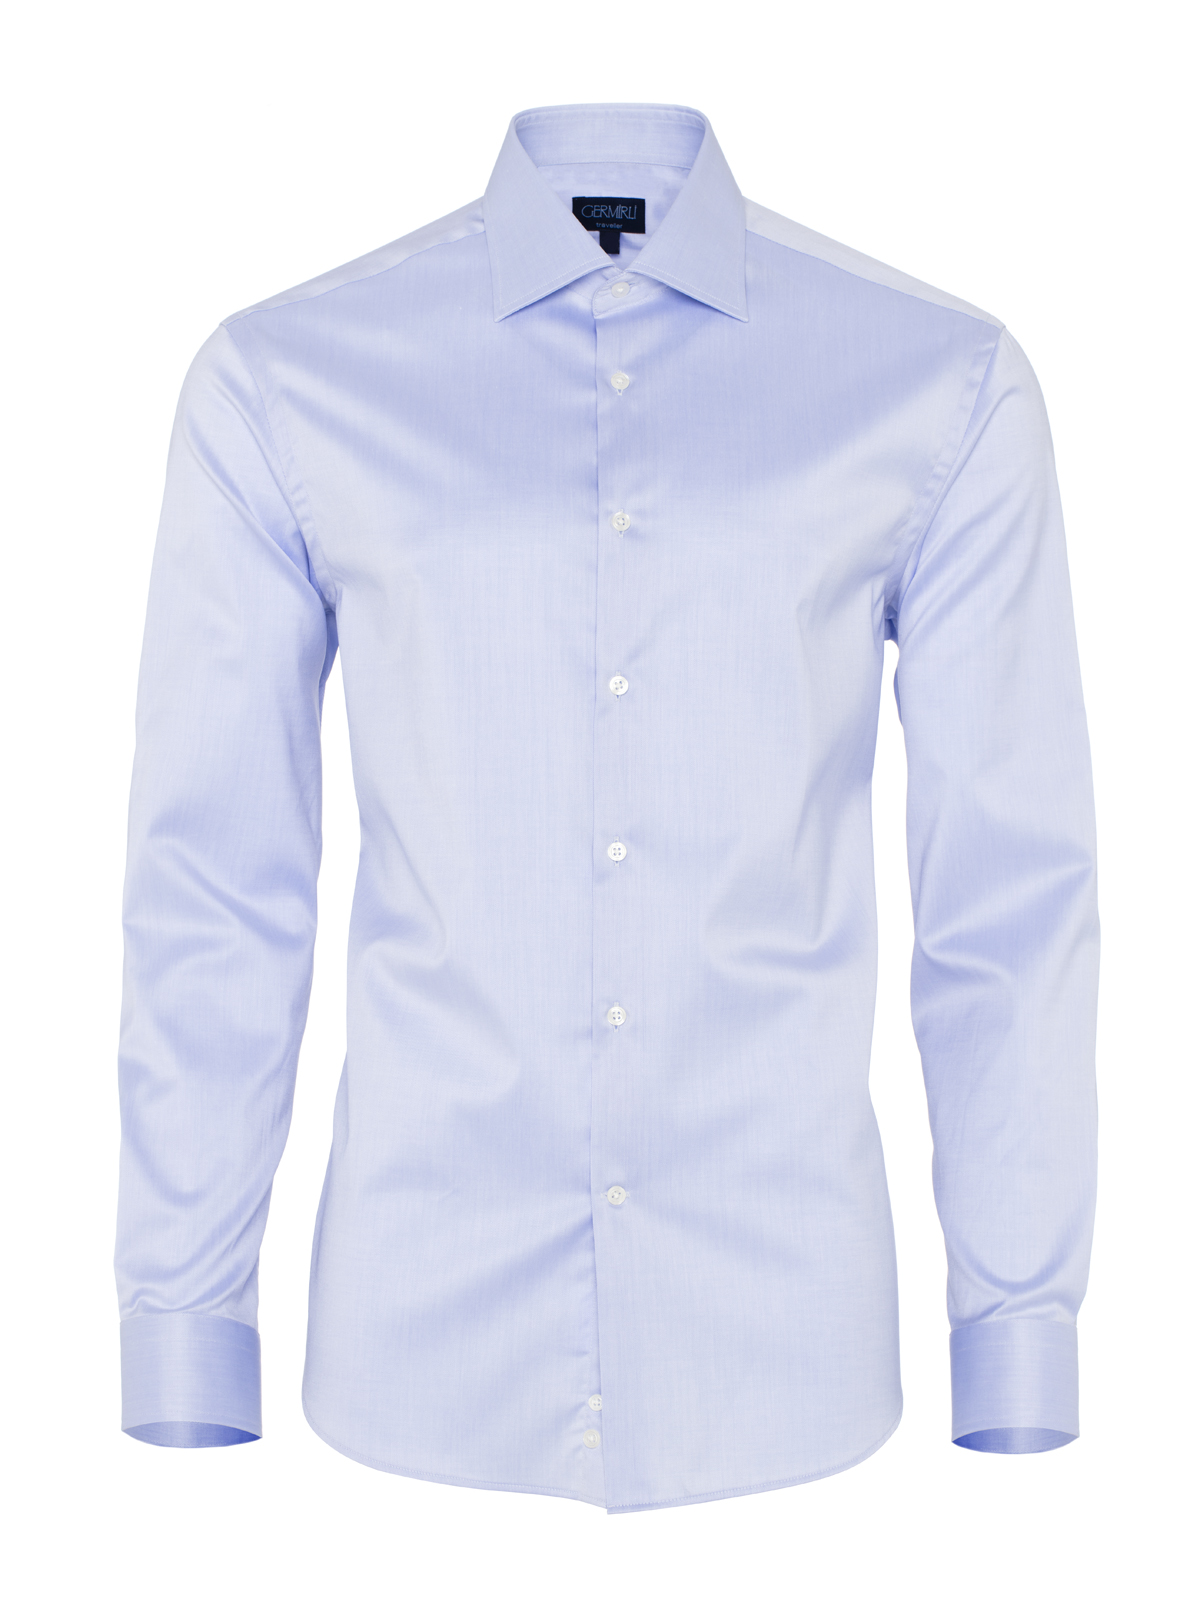 Germirli - Germirli Non Iron Blue Twill Semi Spread Tailor Fit Shirt